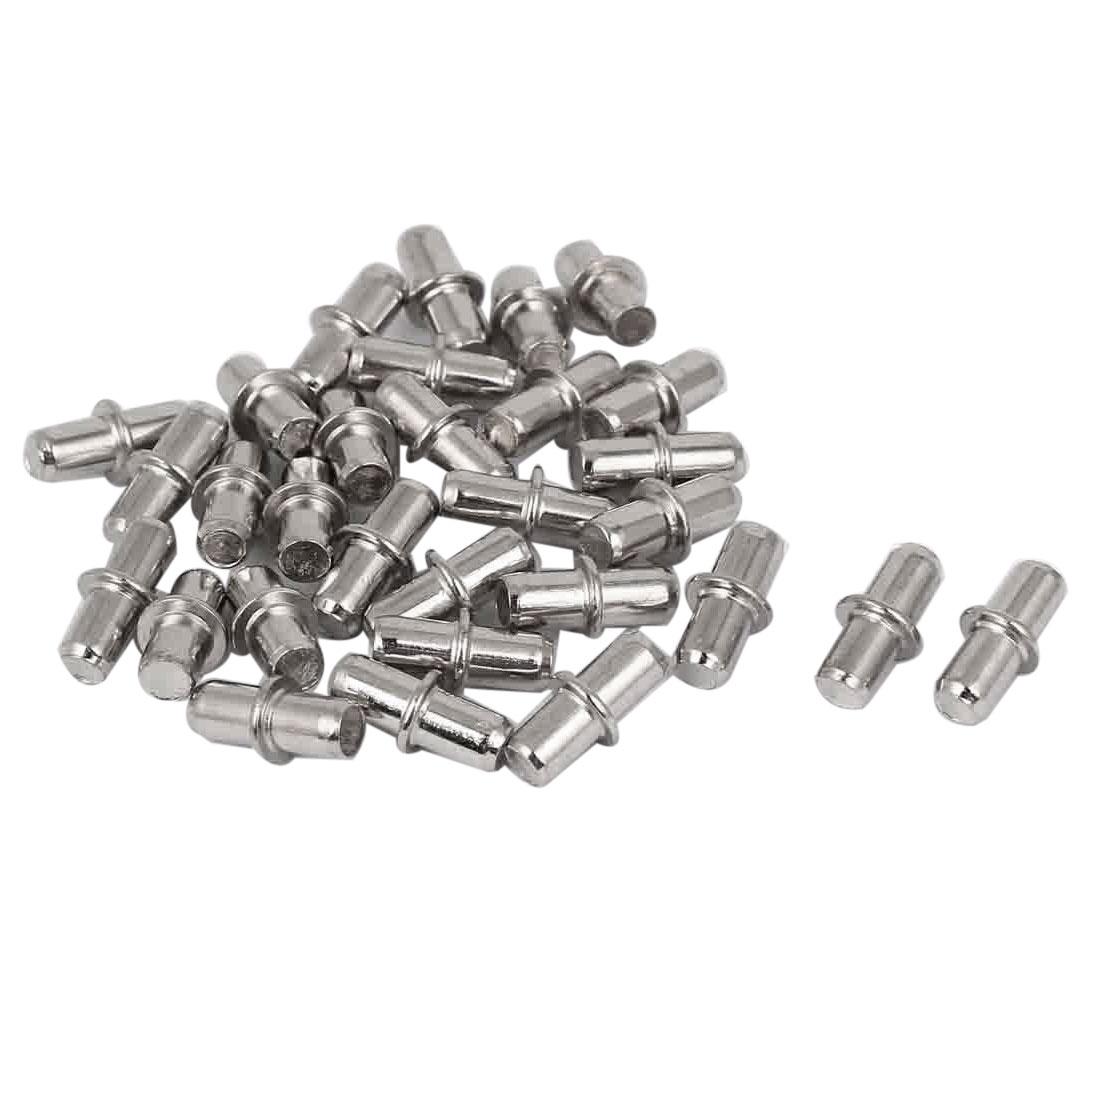 5mm Metal Furniture Cupboard Shelf Pins Pegs Supports Holder 30 Pcs